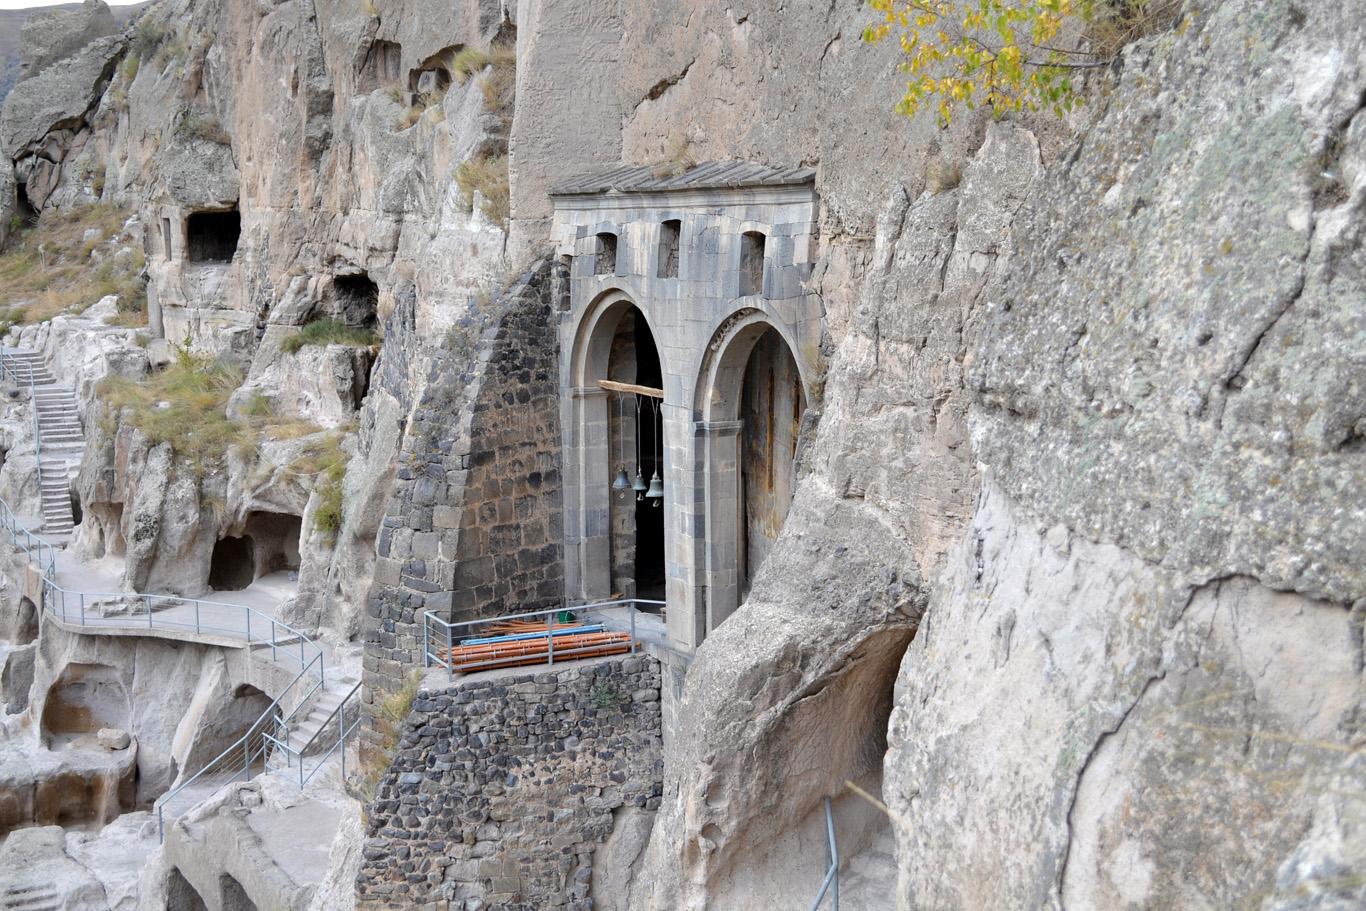 Vardzia - The gate to church of the Dormition